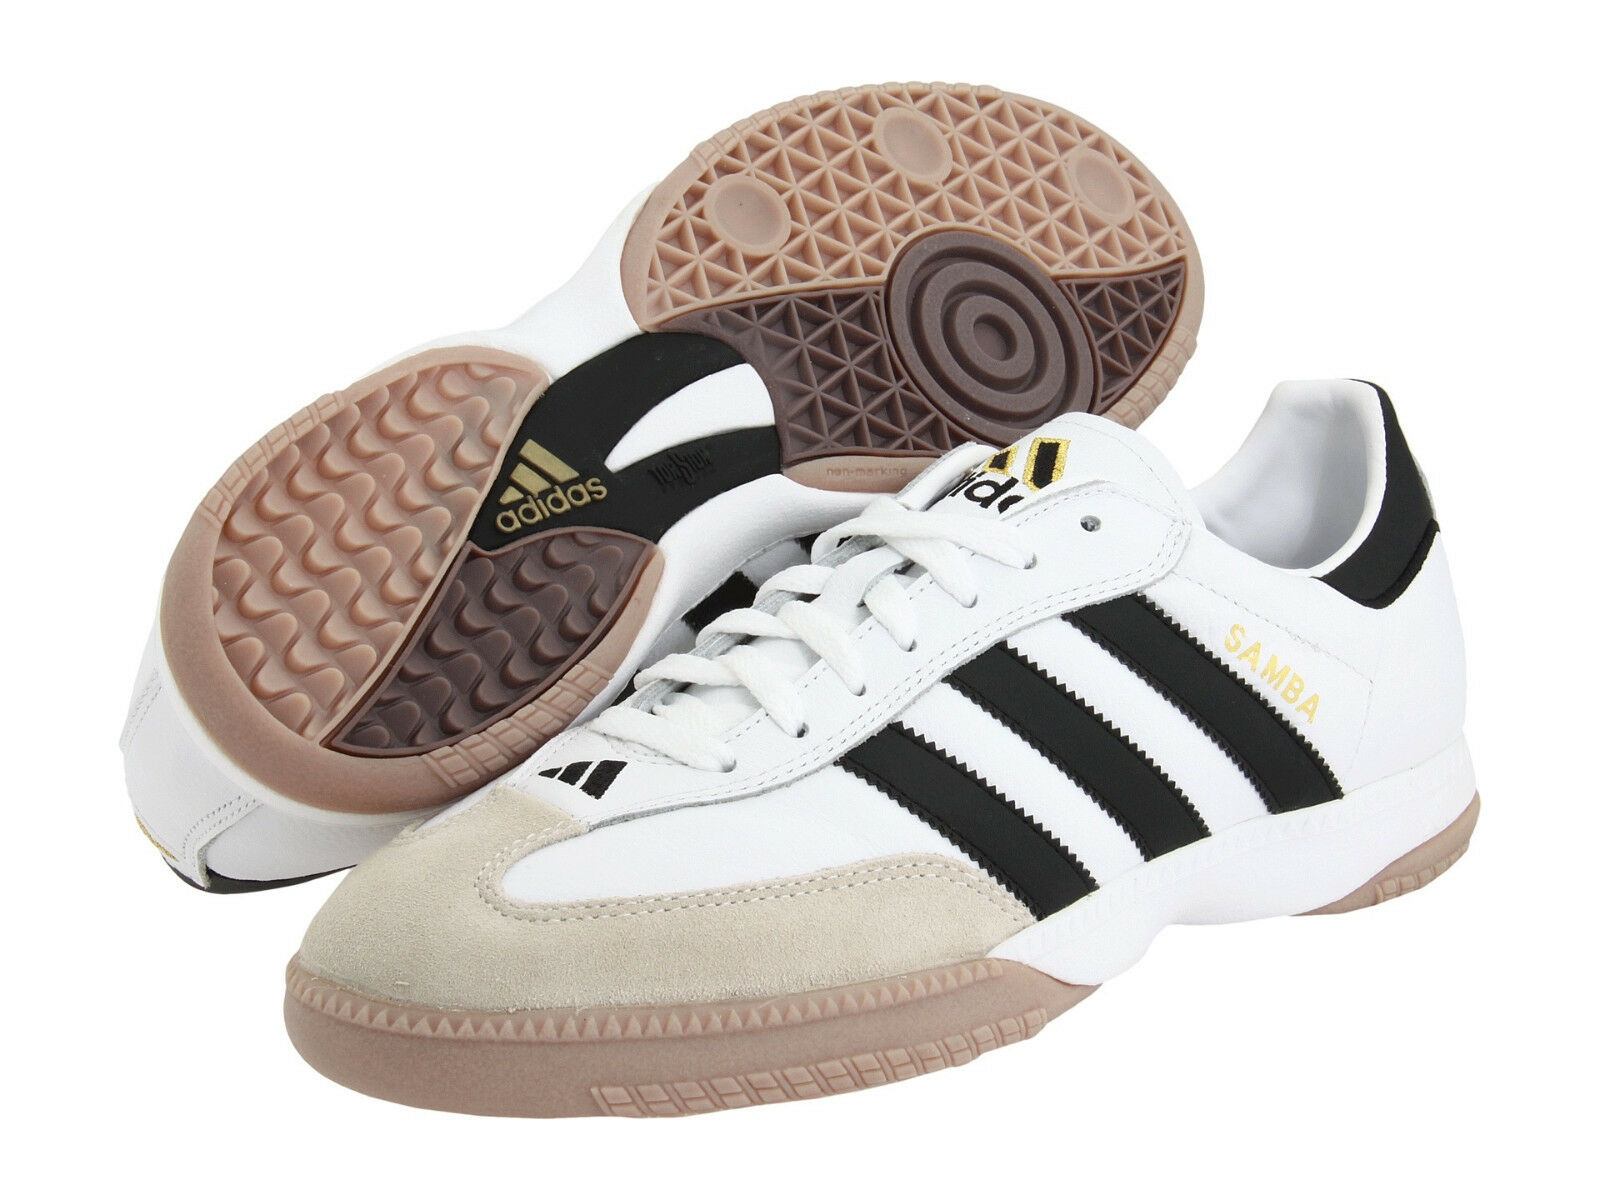 Adidas bianco, samba del calcio indoor bianco, Adidas scarpe da ginnastica 661694 Uomo numero 7 9f0675